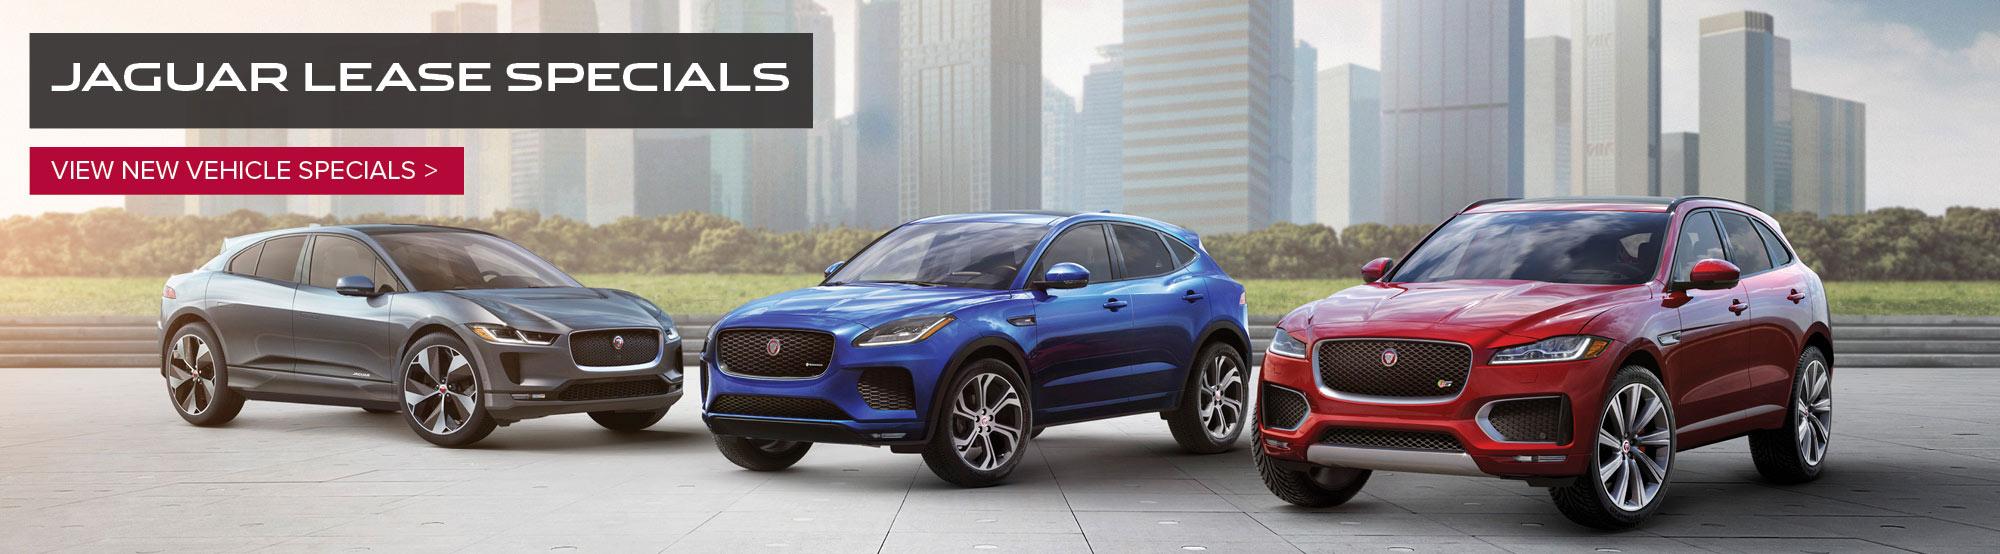 Jaguar Southampton New Used Luxury Car Dealership